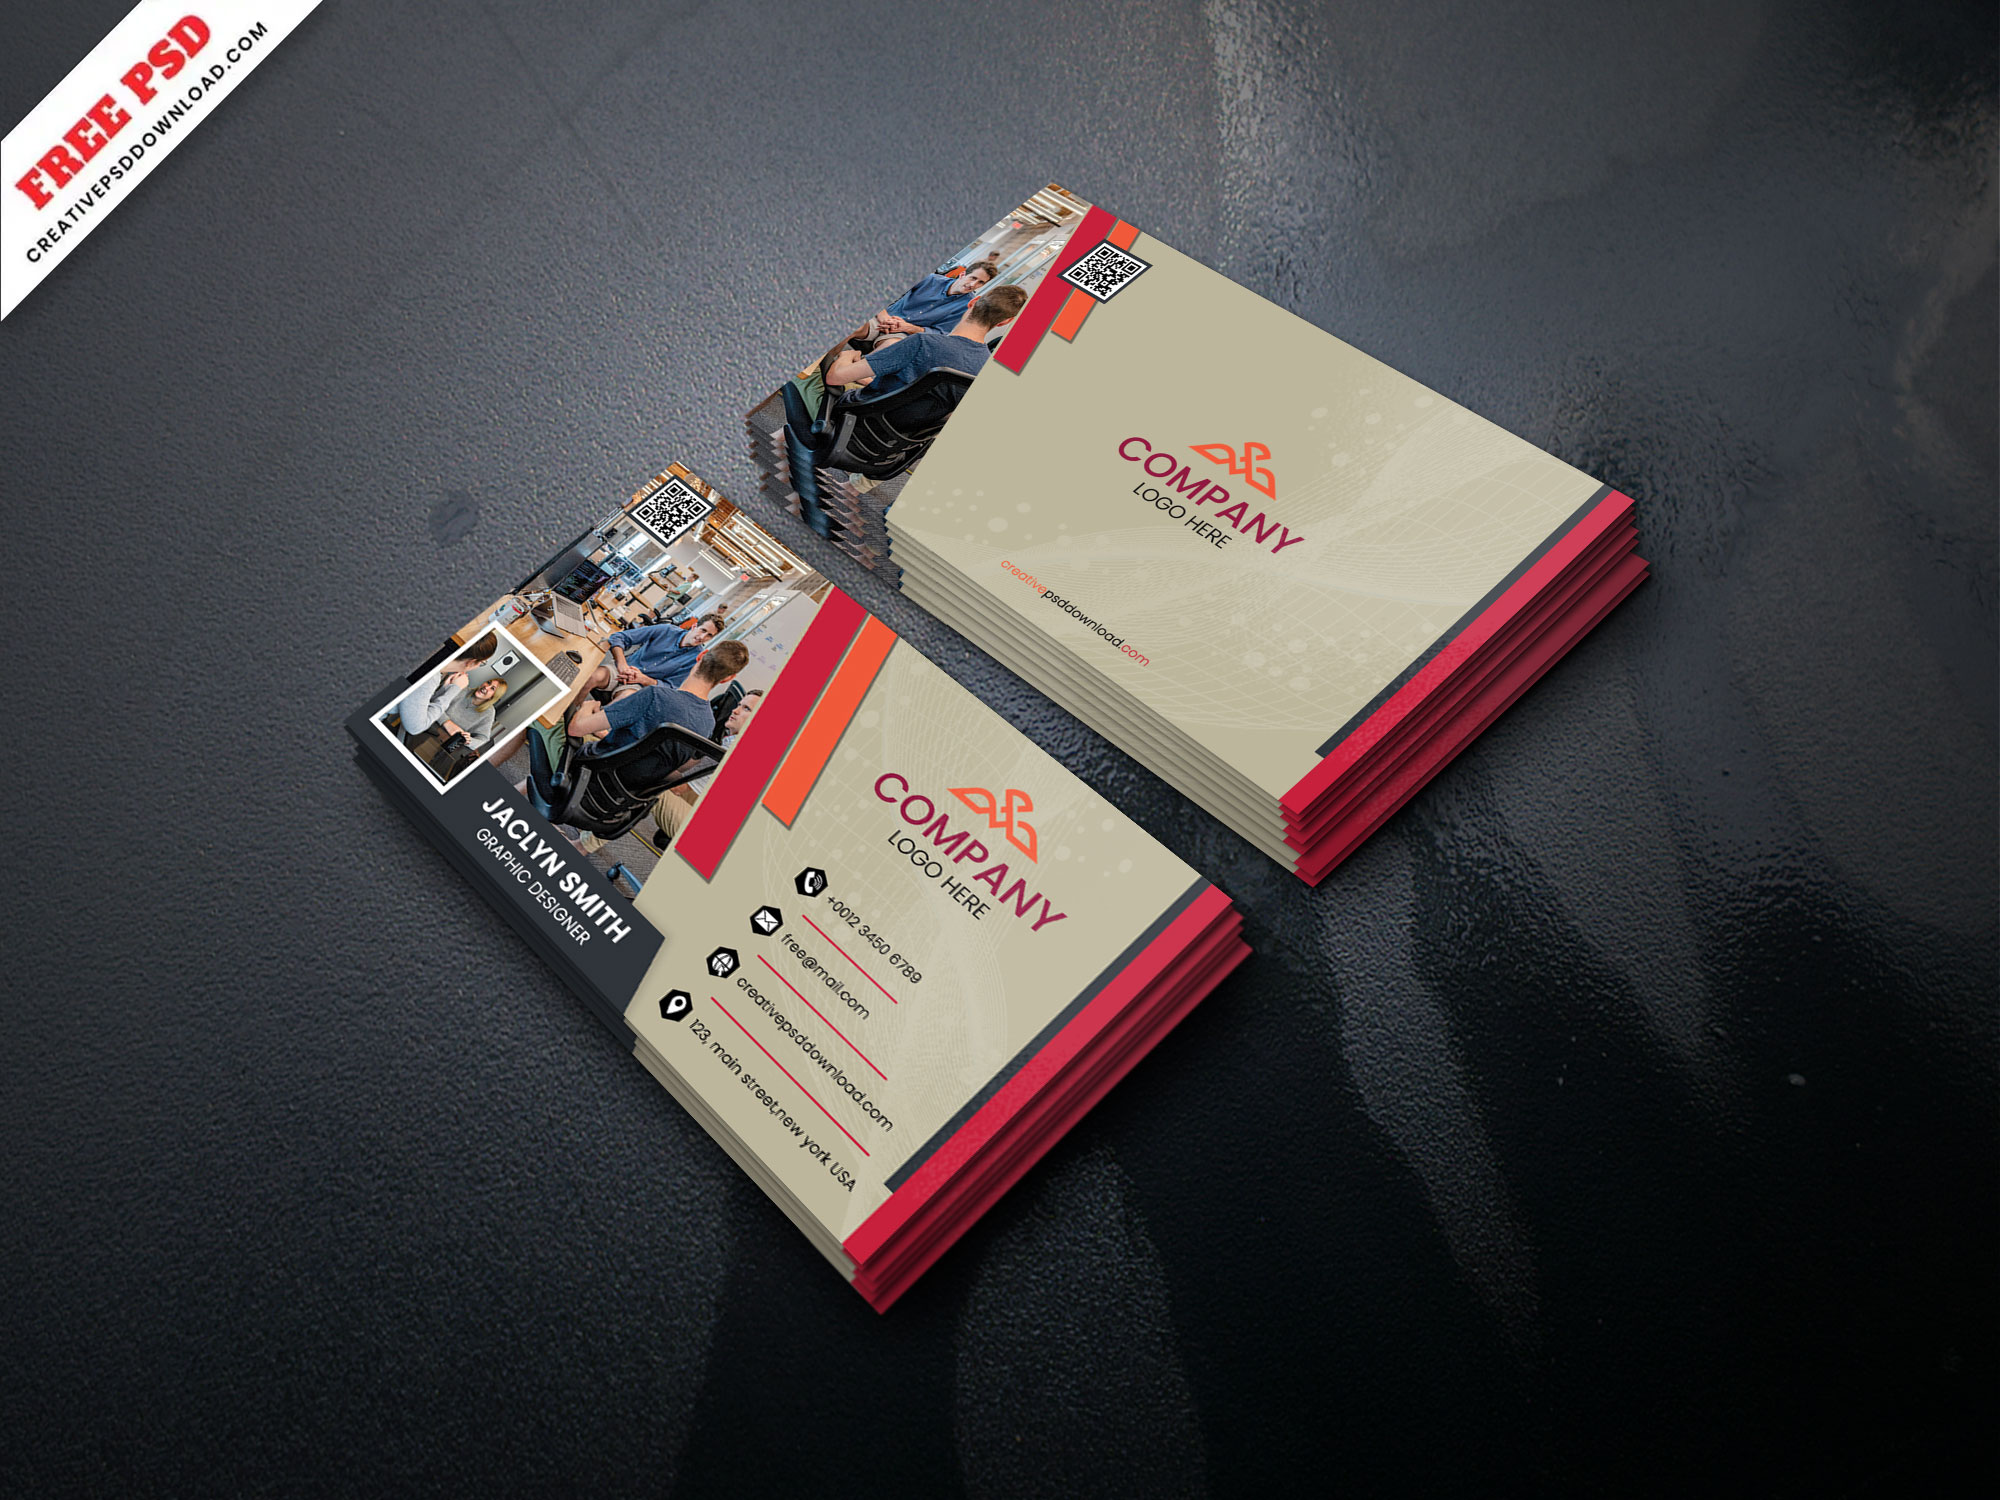 business card, free business card, free business card psd, business card free psd, corporate business card, corporate business card free psd, psd business card, business card freebie, creativepsddownload, primepsd, psdbuddy